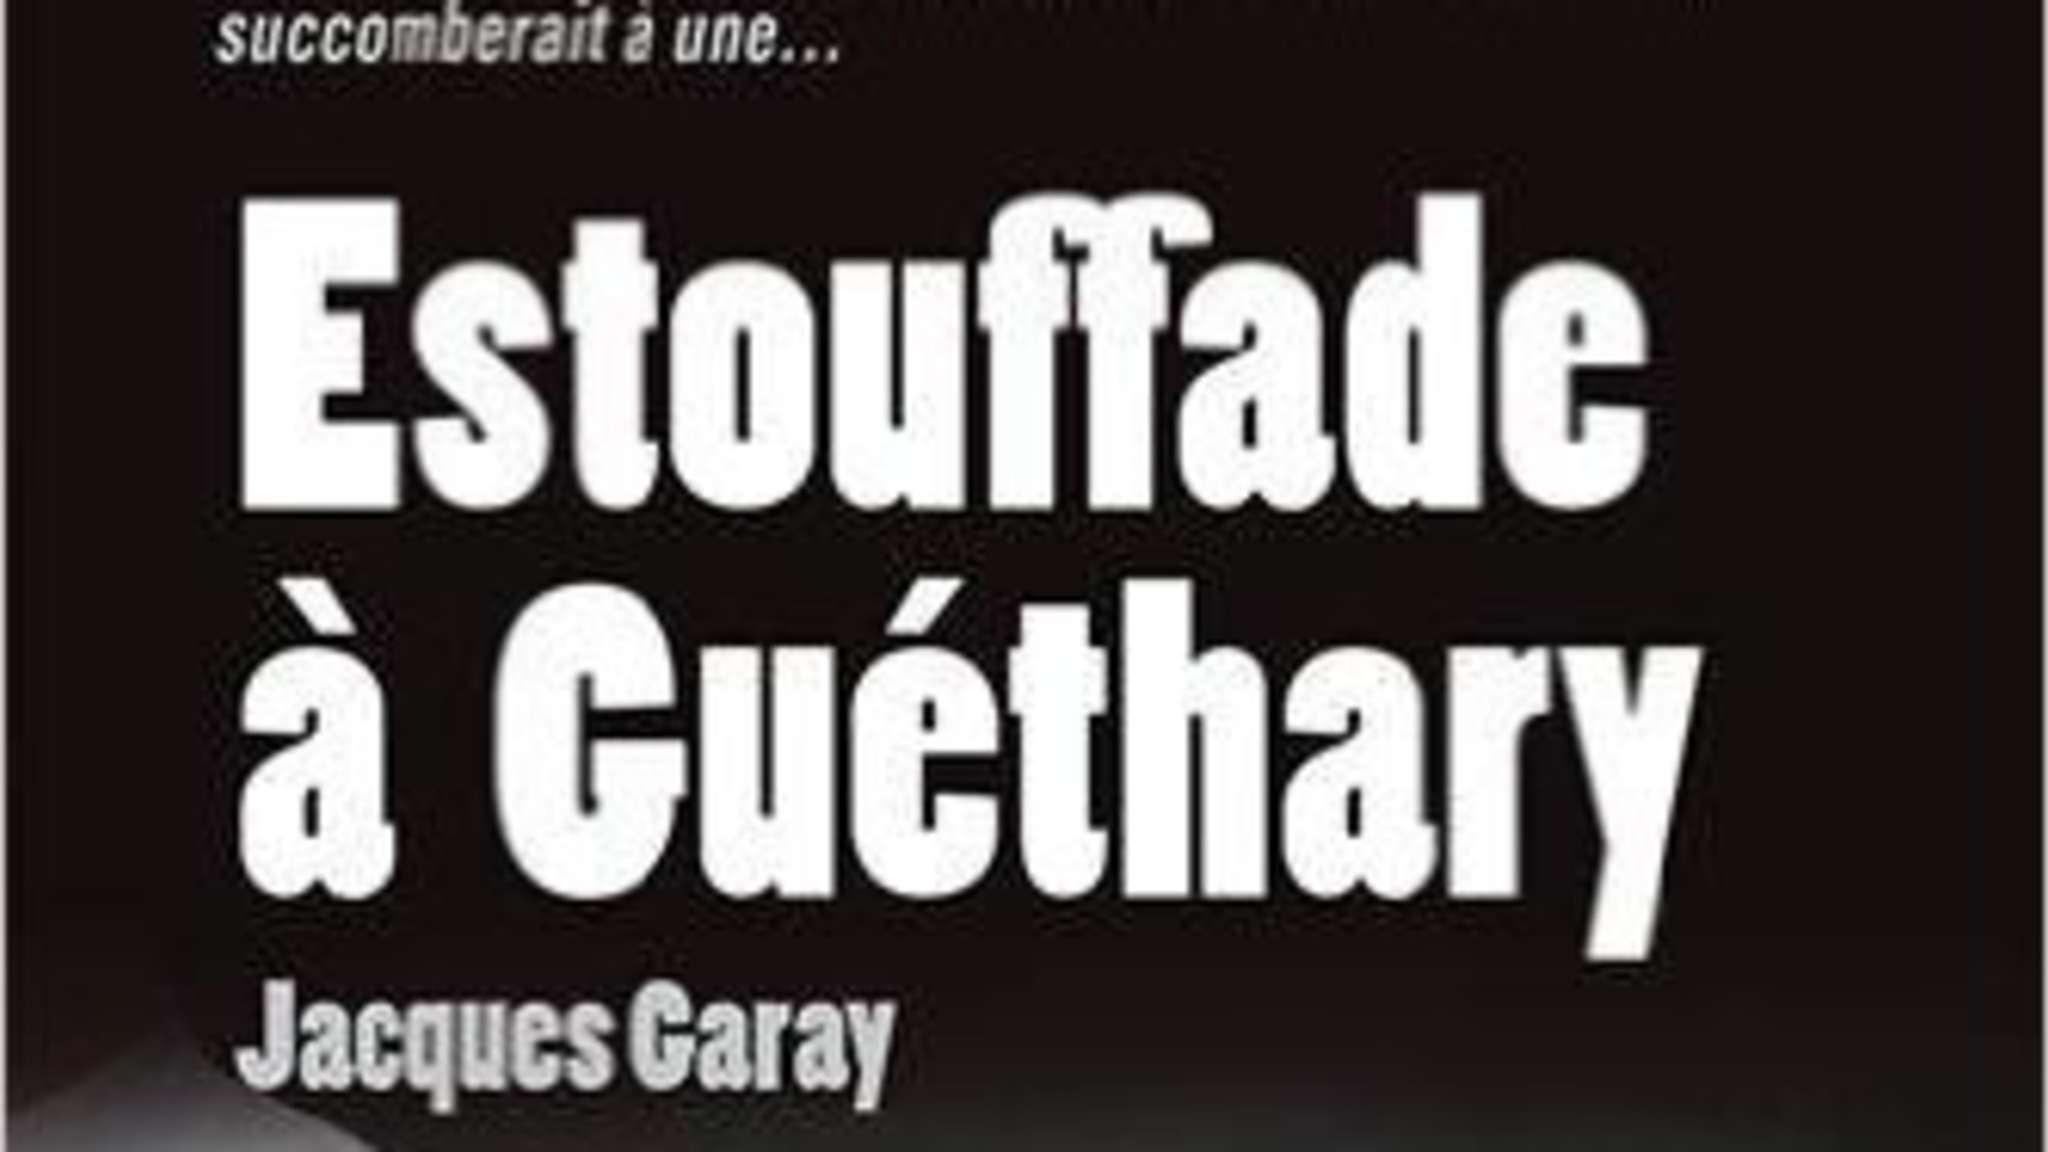 Garay (Jacques)